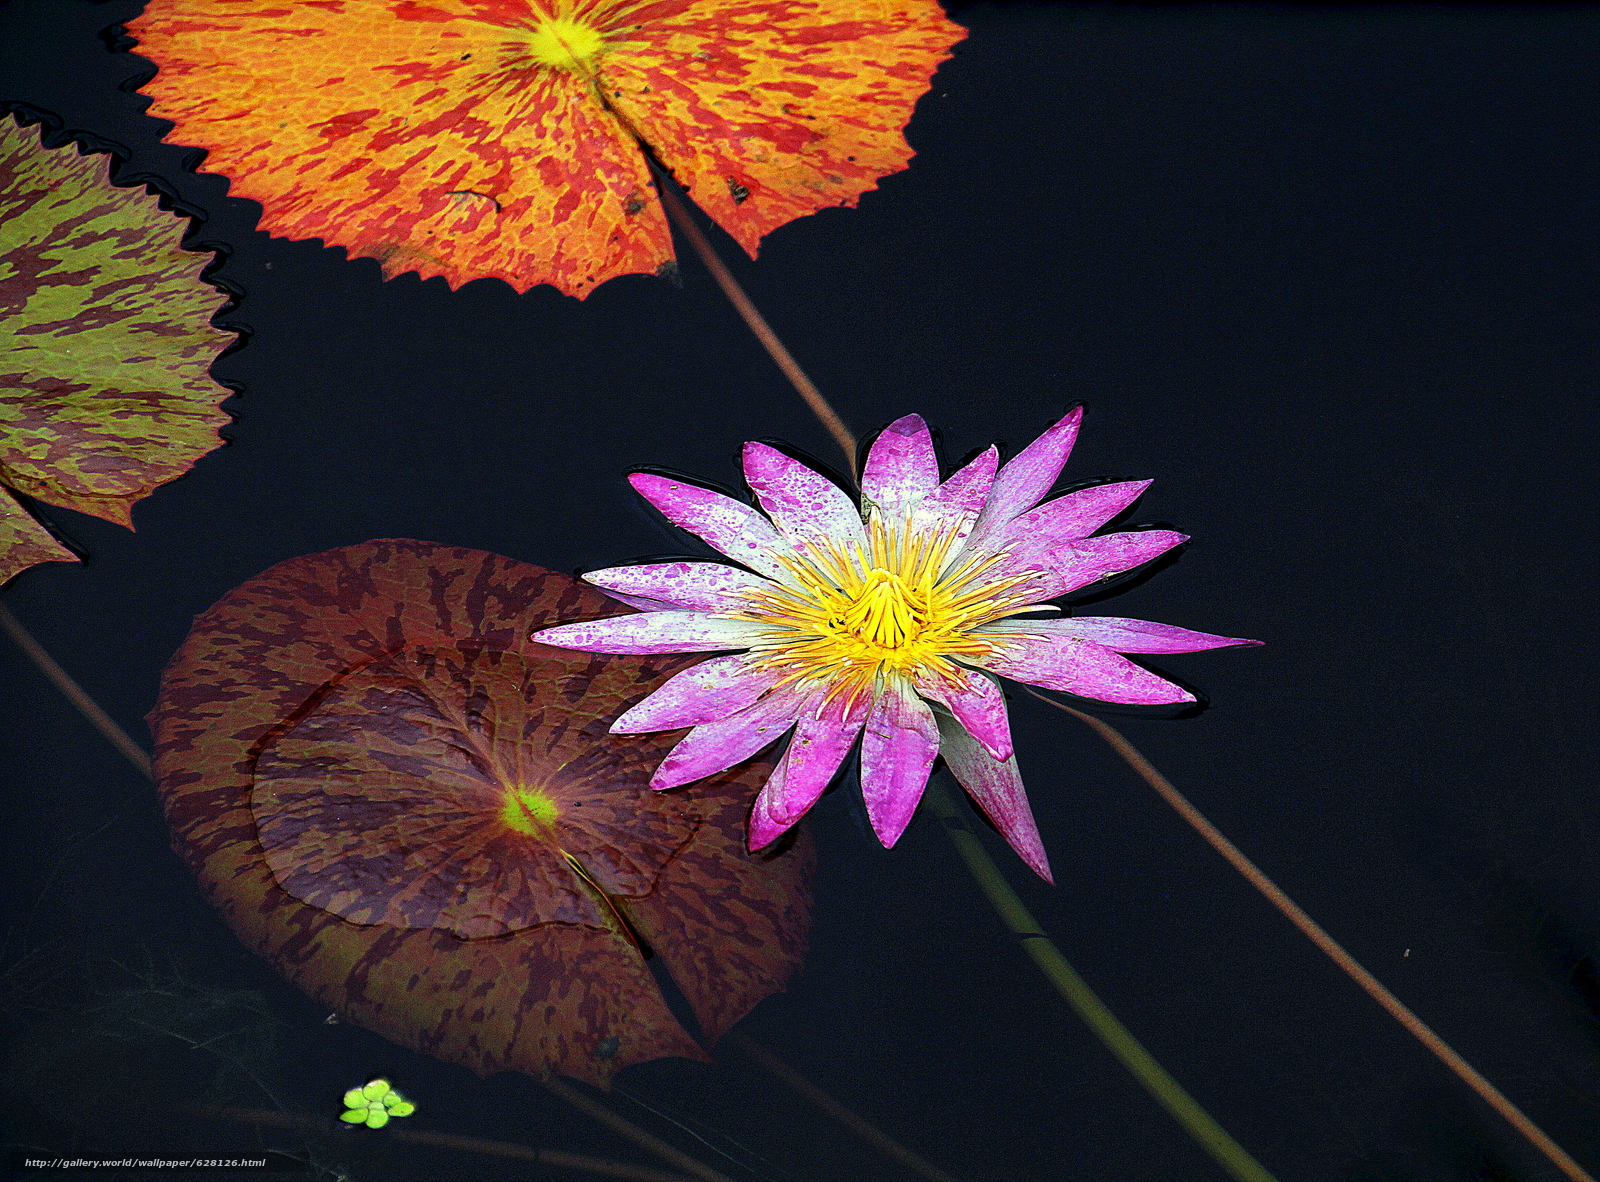 Water Lily, Водяная лилия, цветок, флора